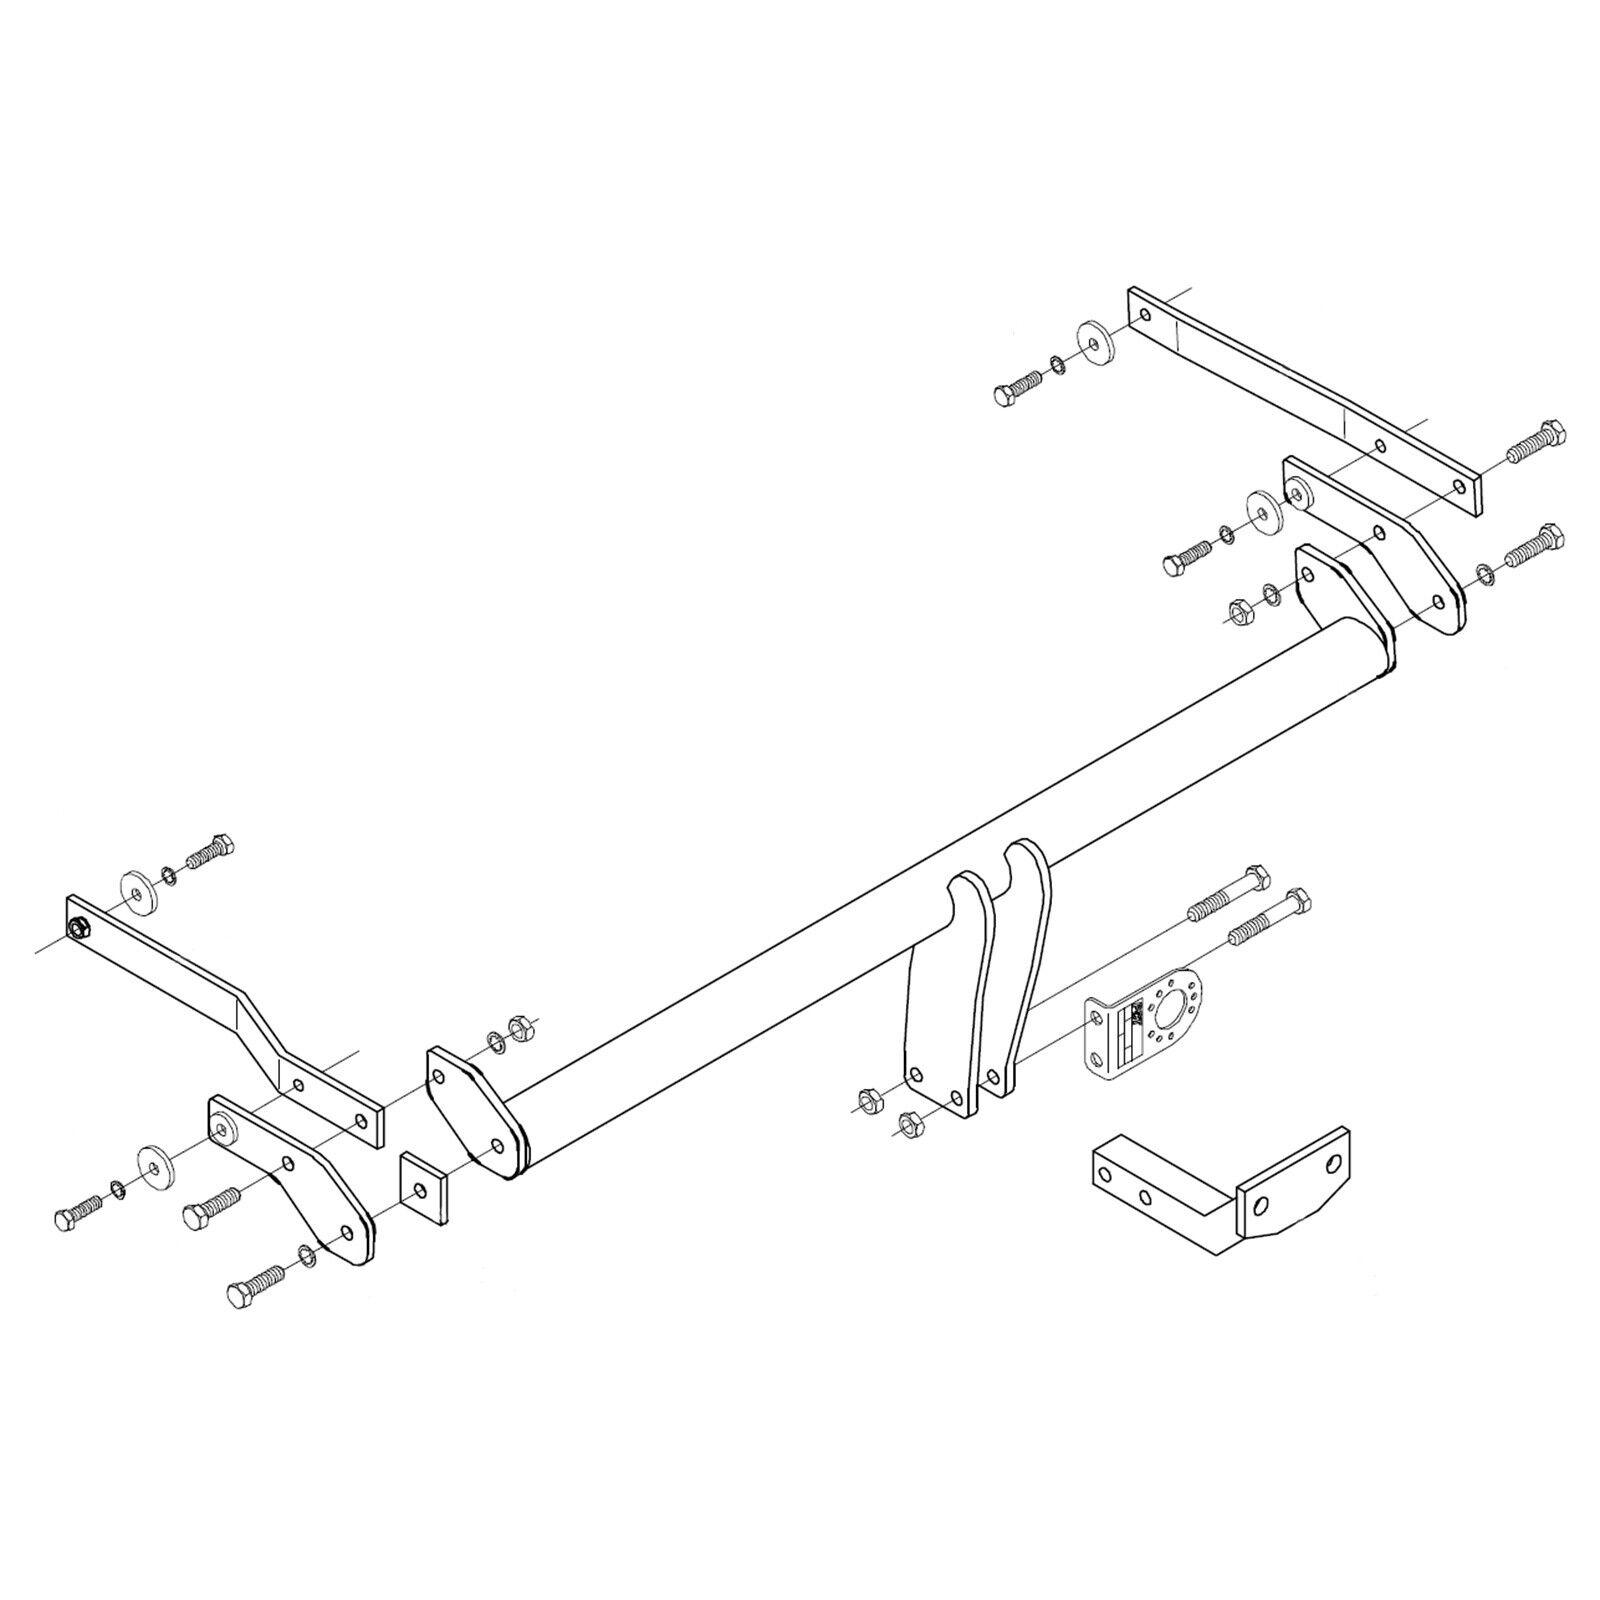 details about towbar for renault megane iii 5 door hatchback 2008 2016 flange tow bar [ 1600 x 1600 Pixel ]